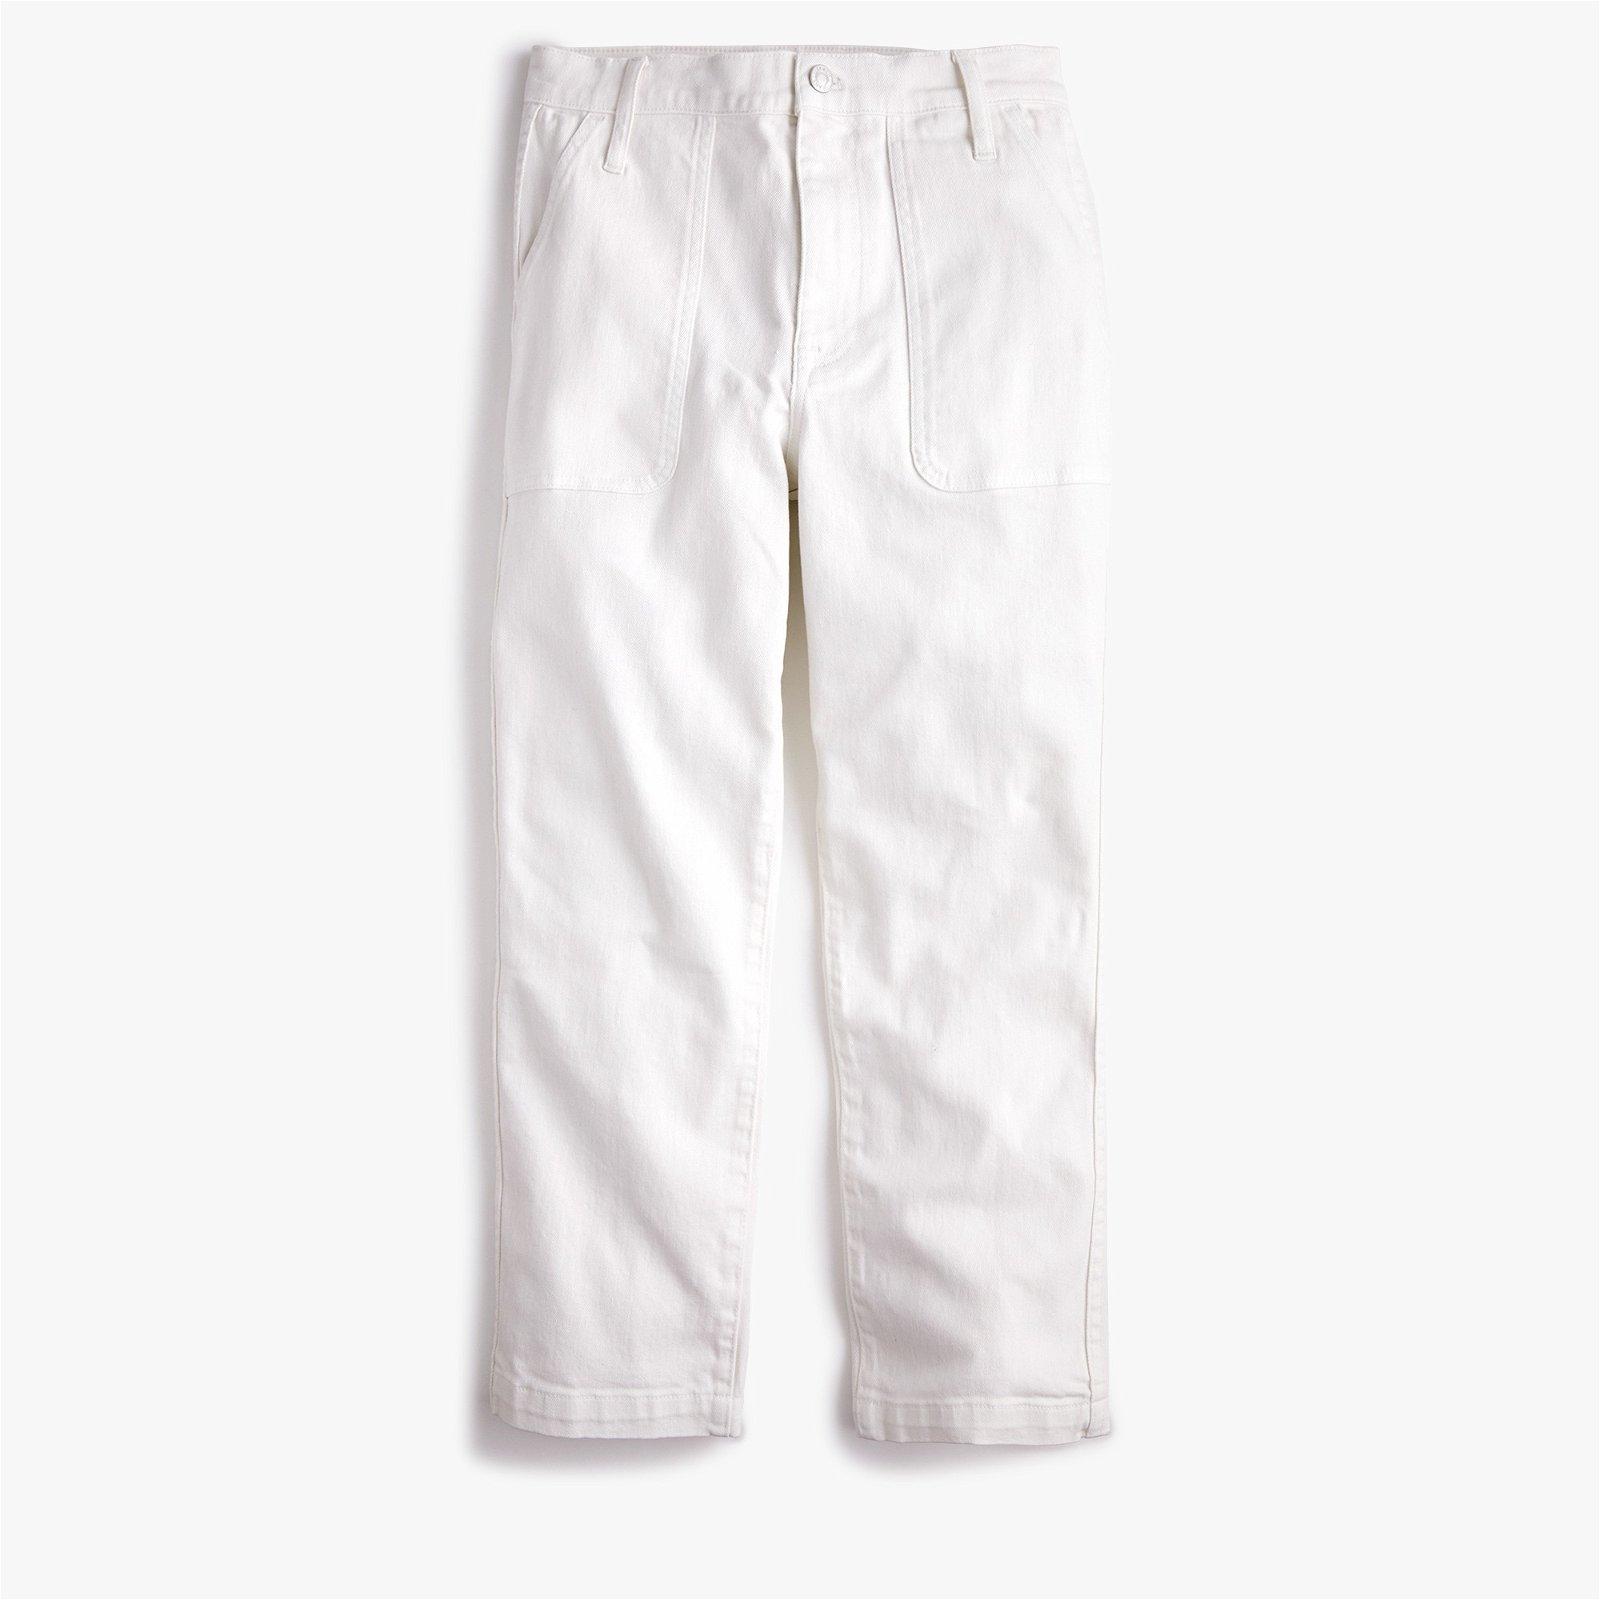 Classic Straight-leg crop jean in garment-dyed denim